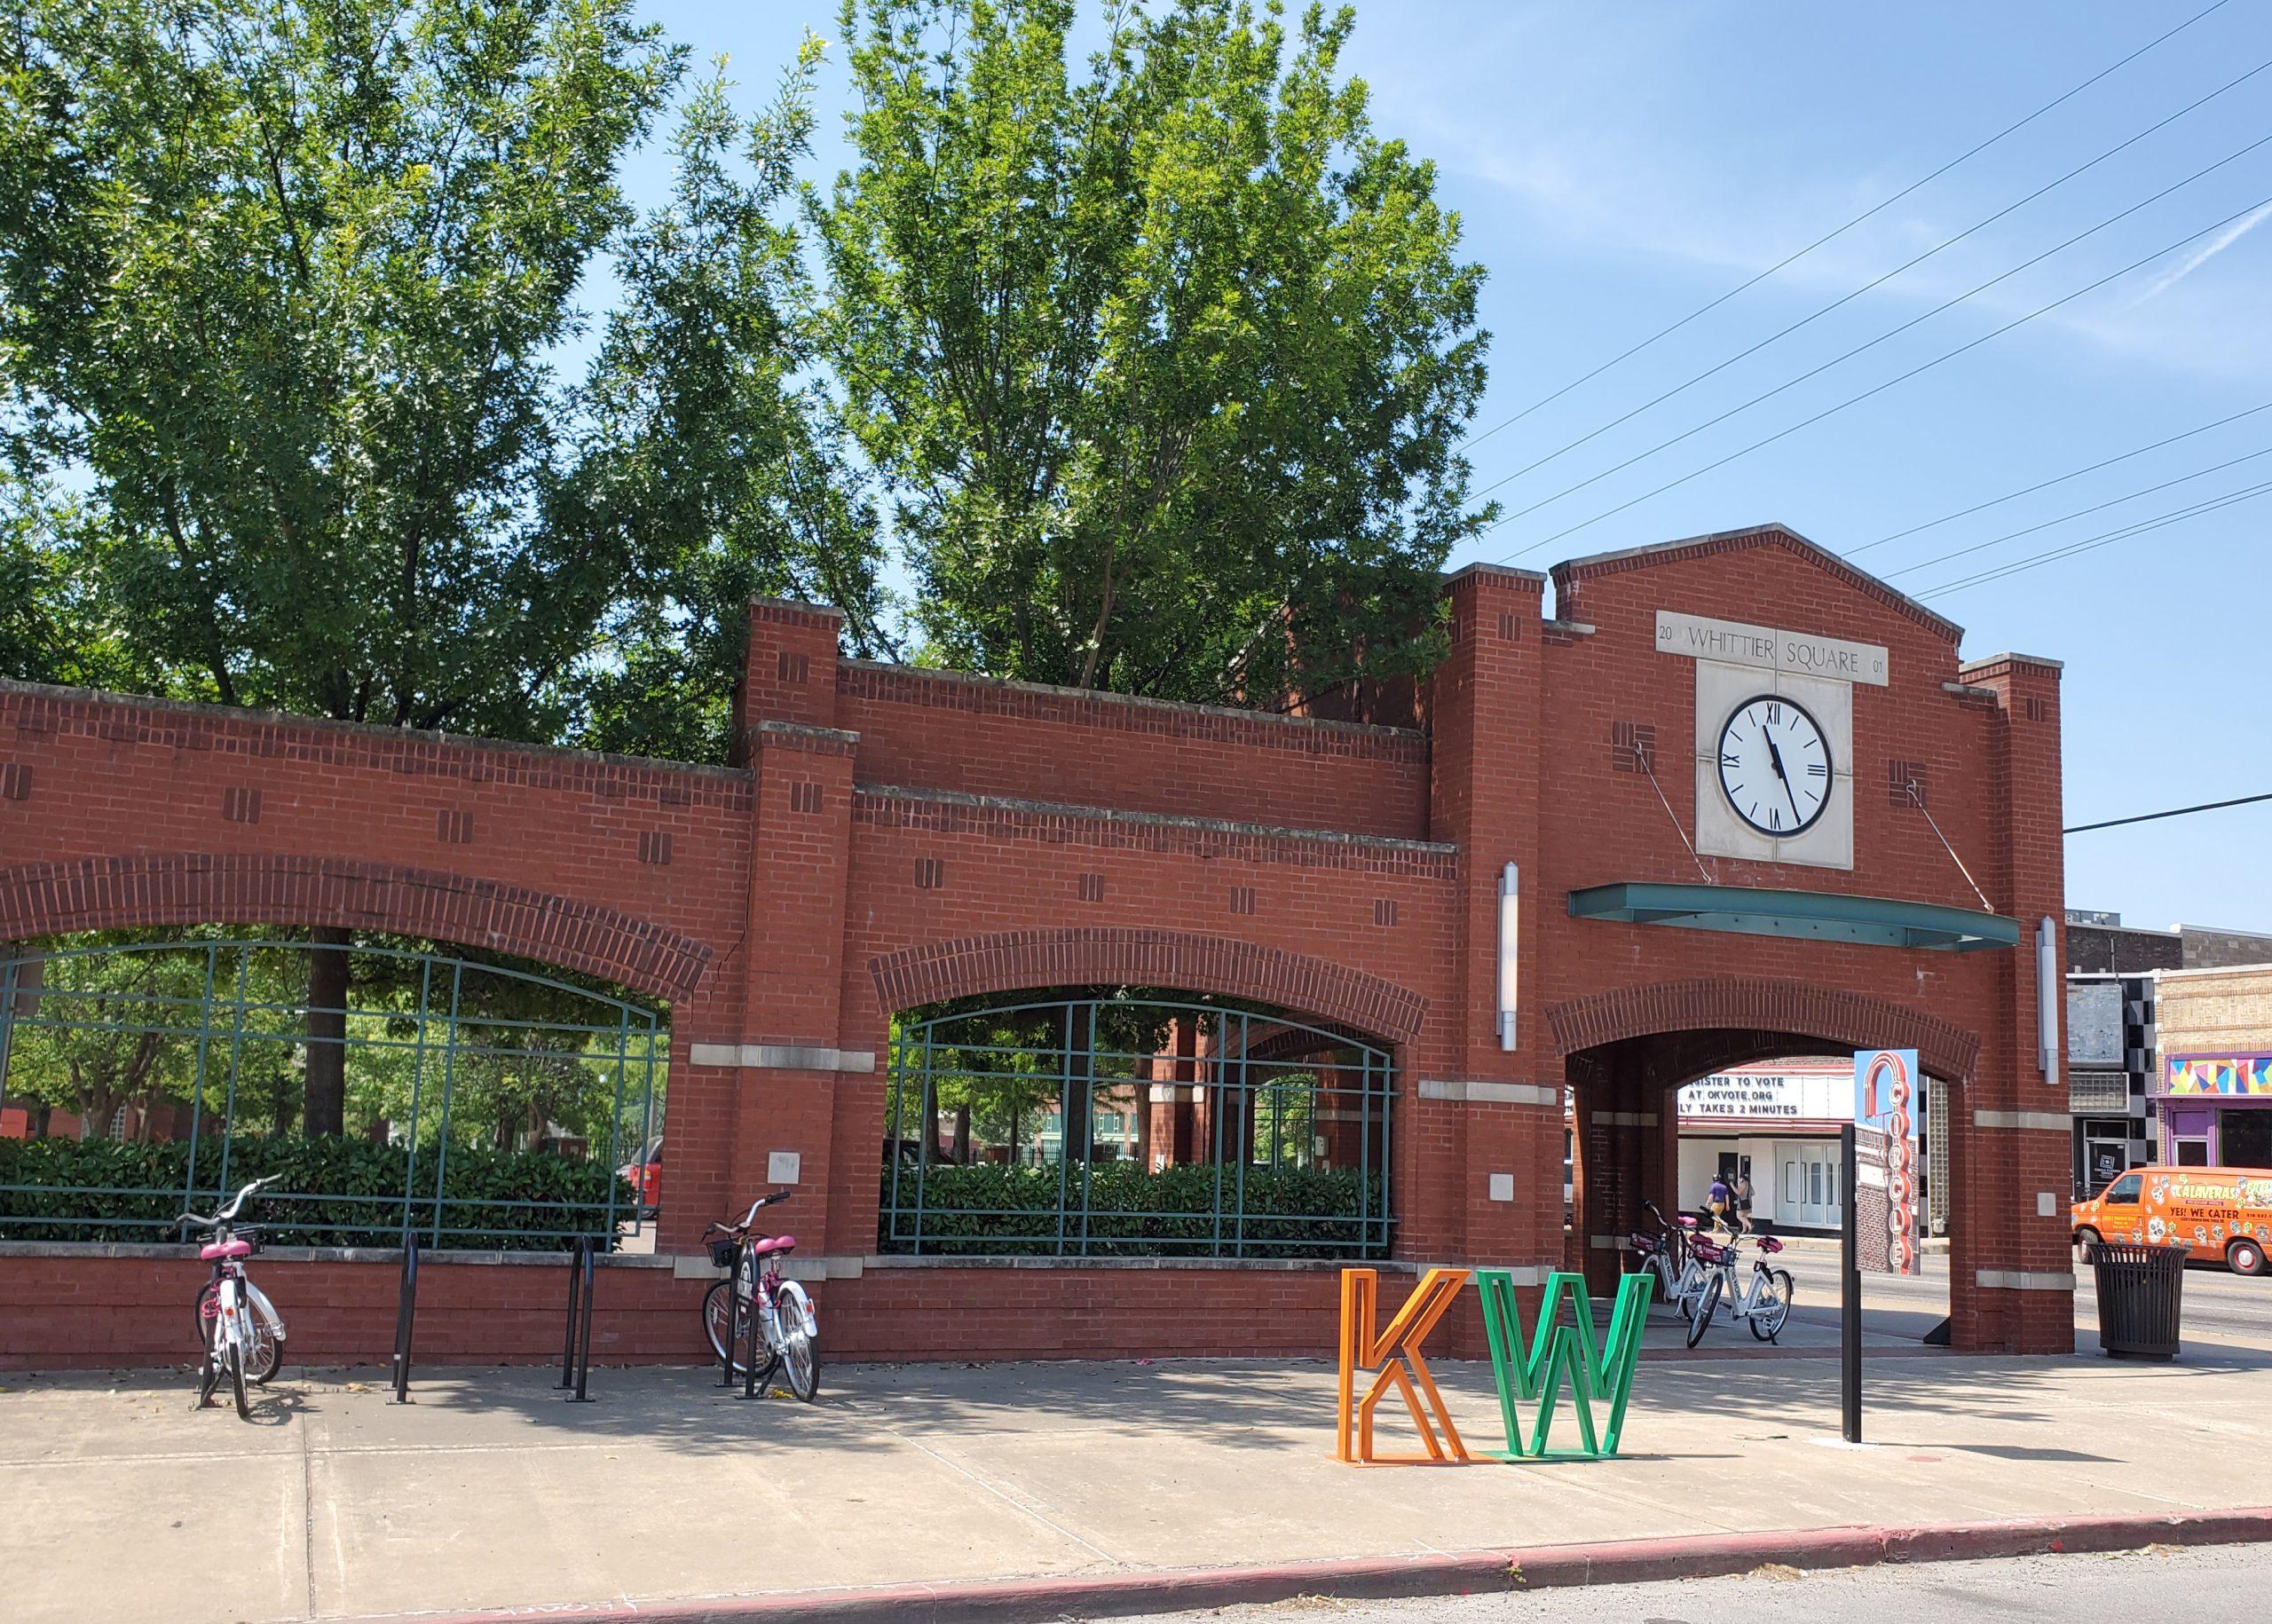 Kendall Whittier Main Street welcomes new Board members